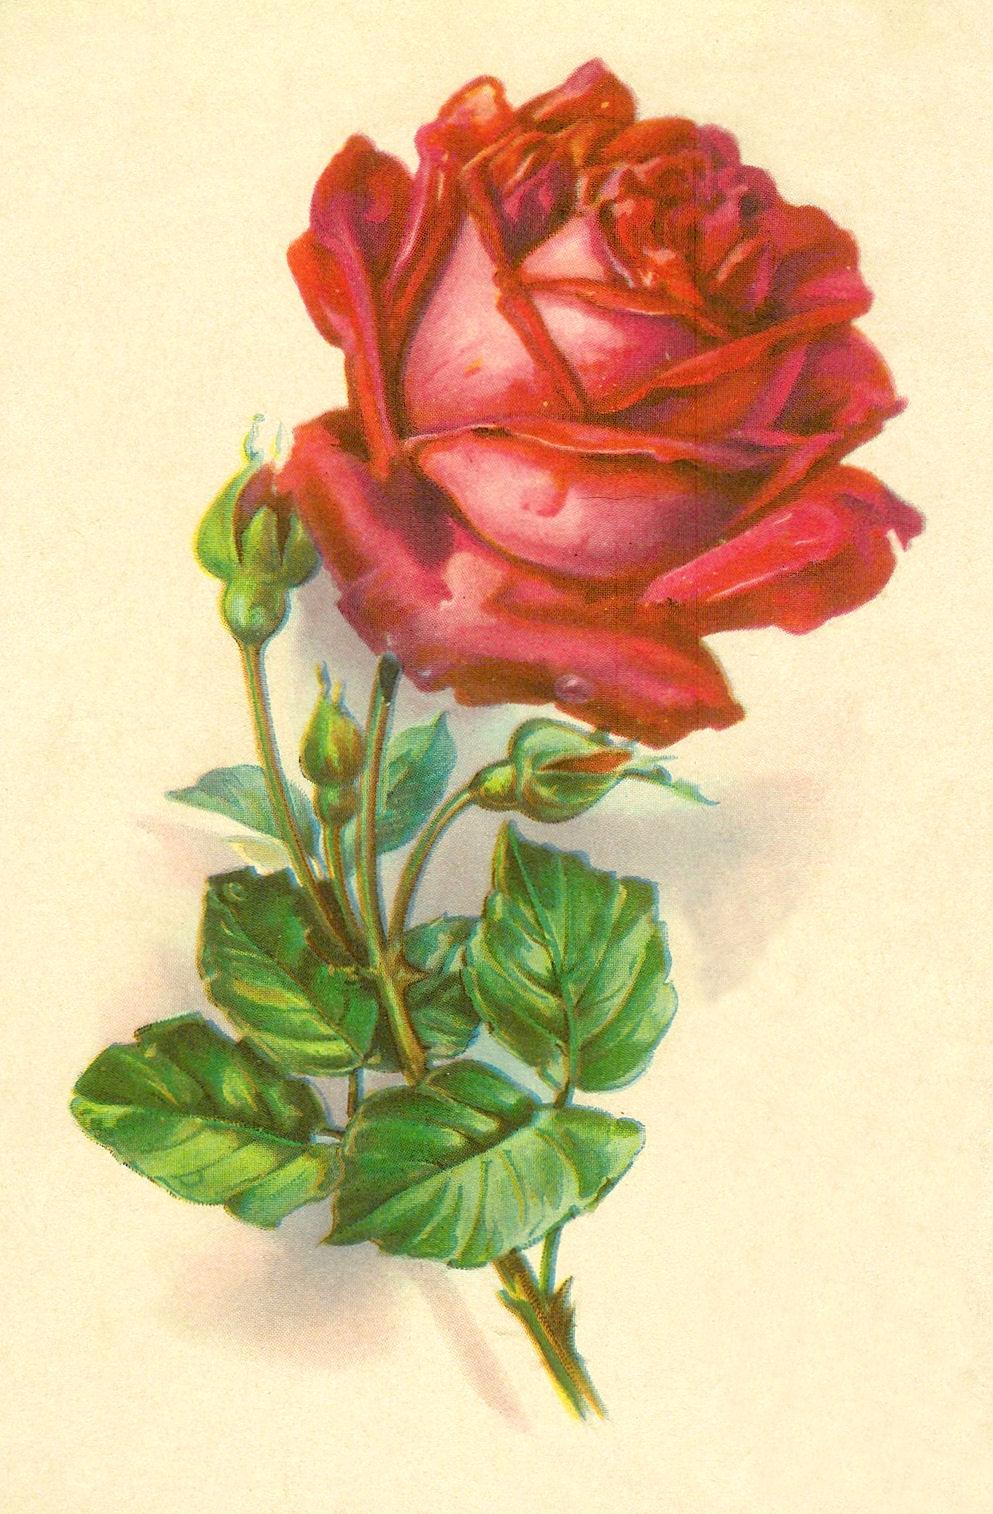 Antique Images Free Rose Graphic Botanical Illustration Of Red